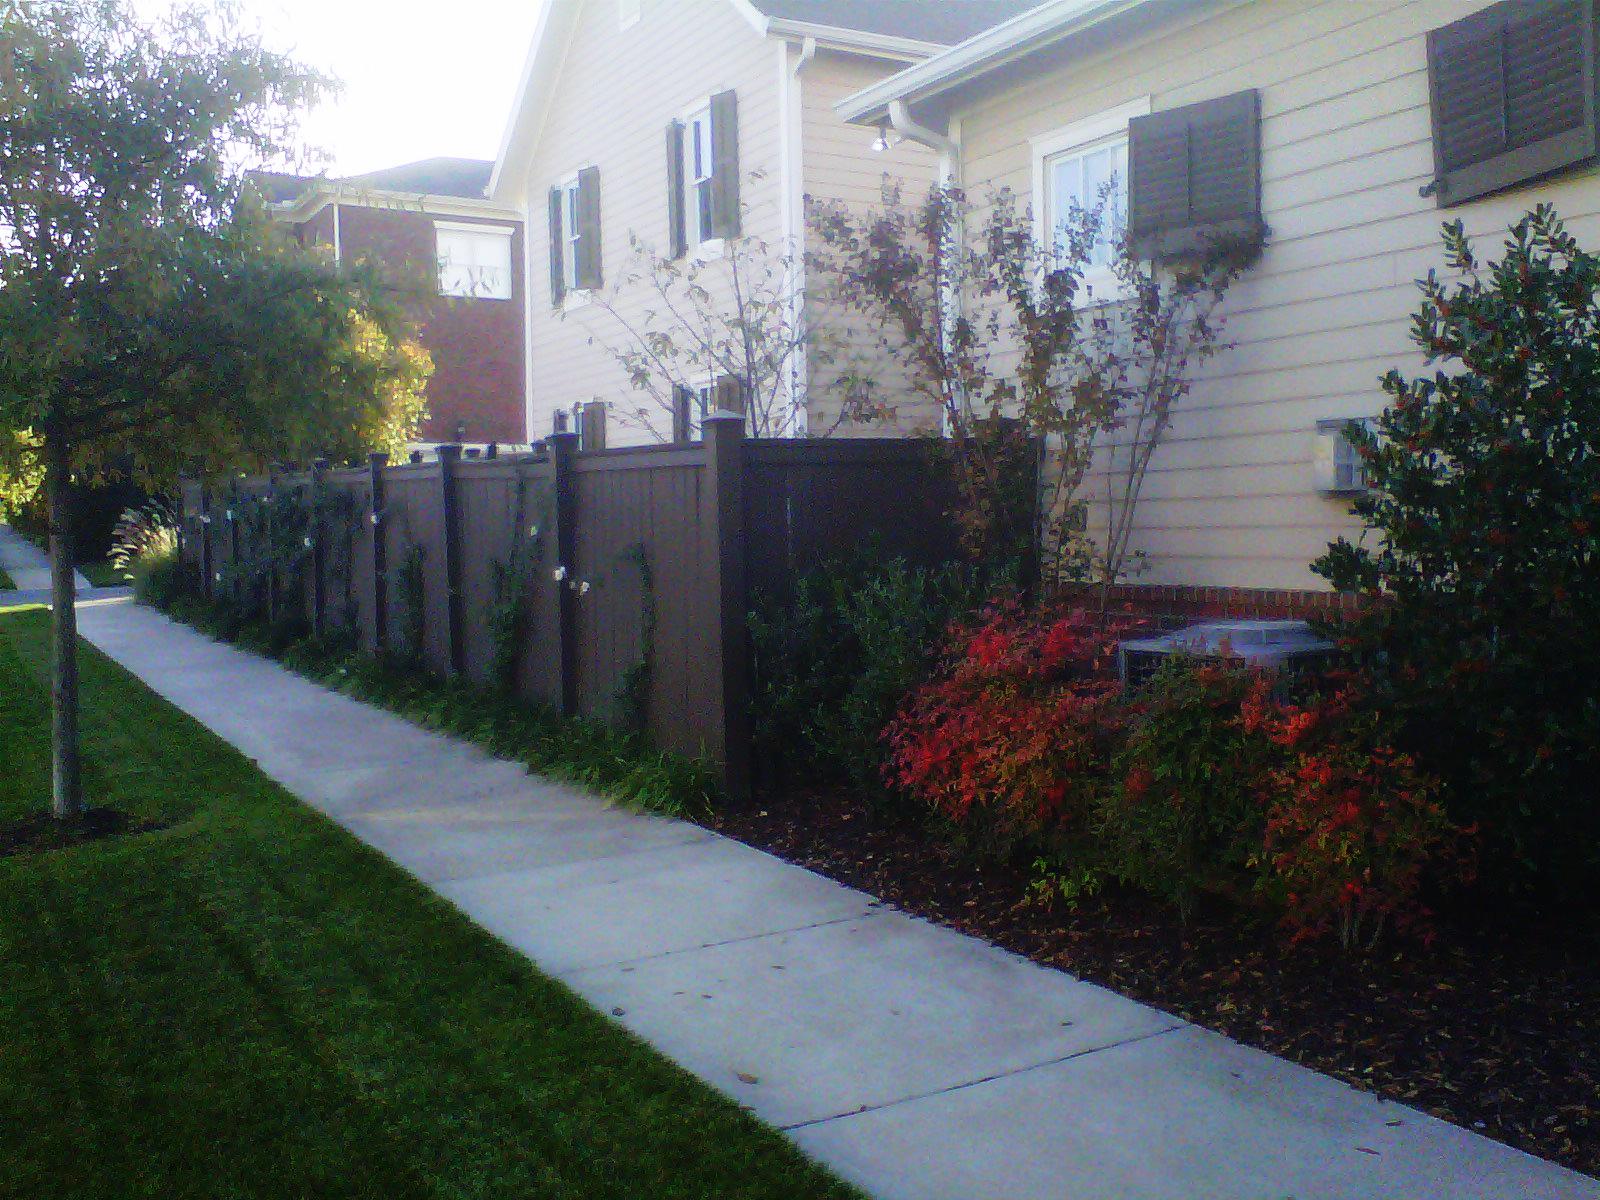 Justin Stelter Landscape Gardening - Modern Suburban Landscaping - 12592059964_97db921cf0_o.jpg